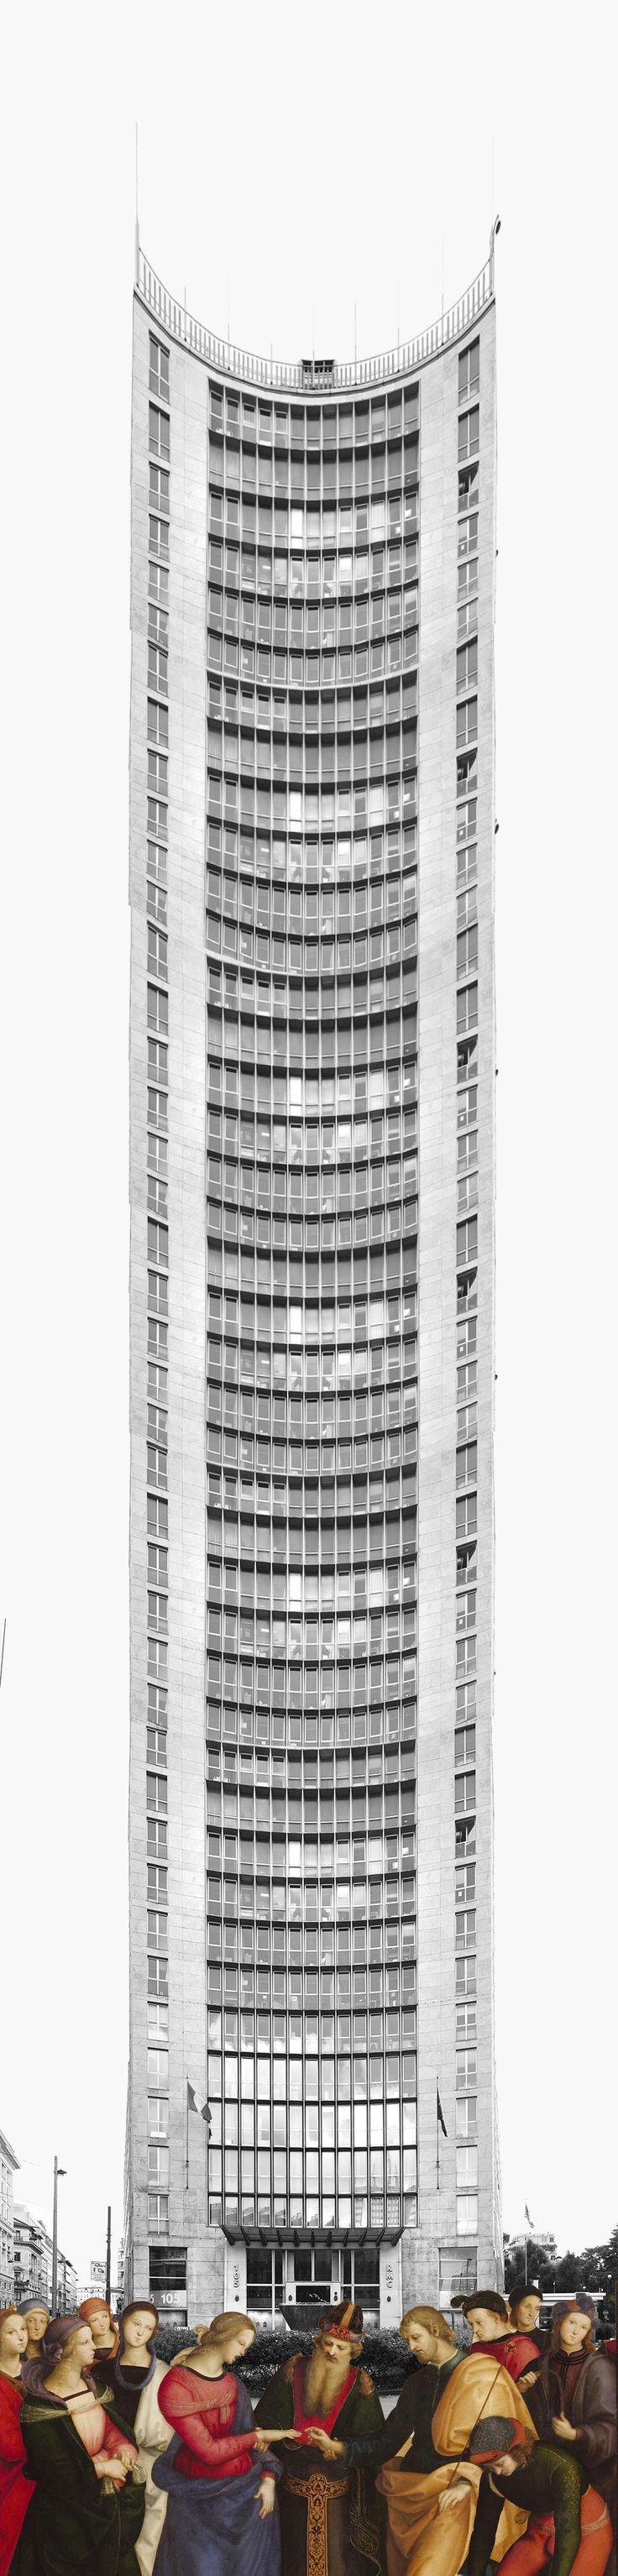 Onirico Milano #1.